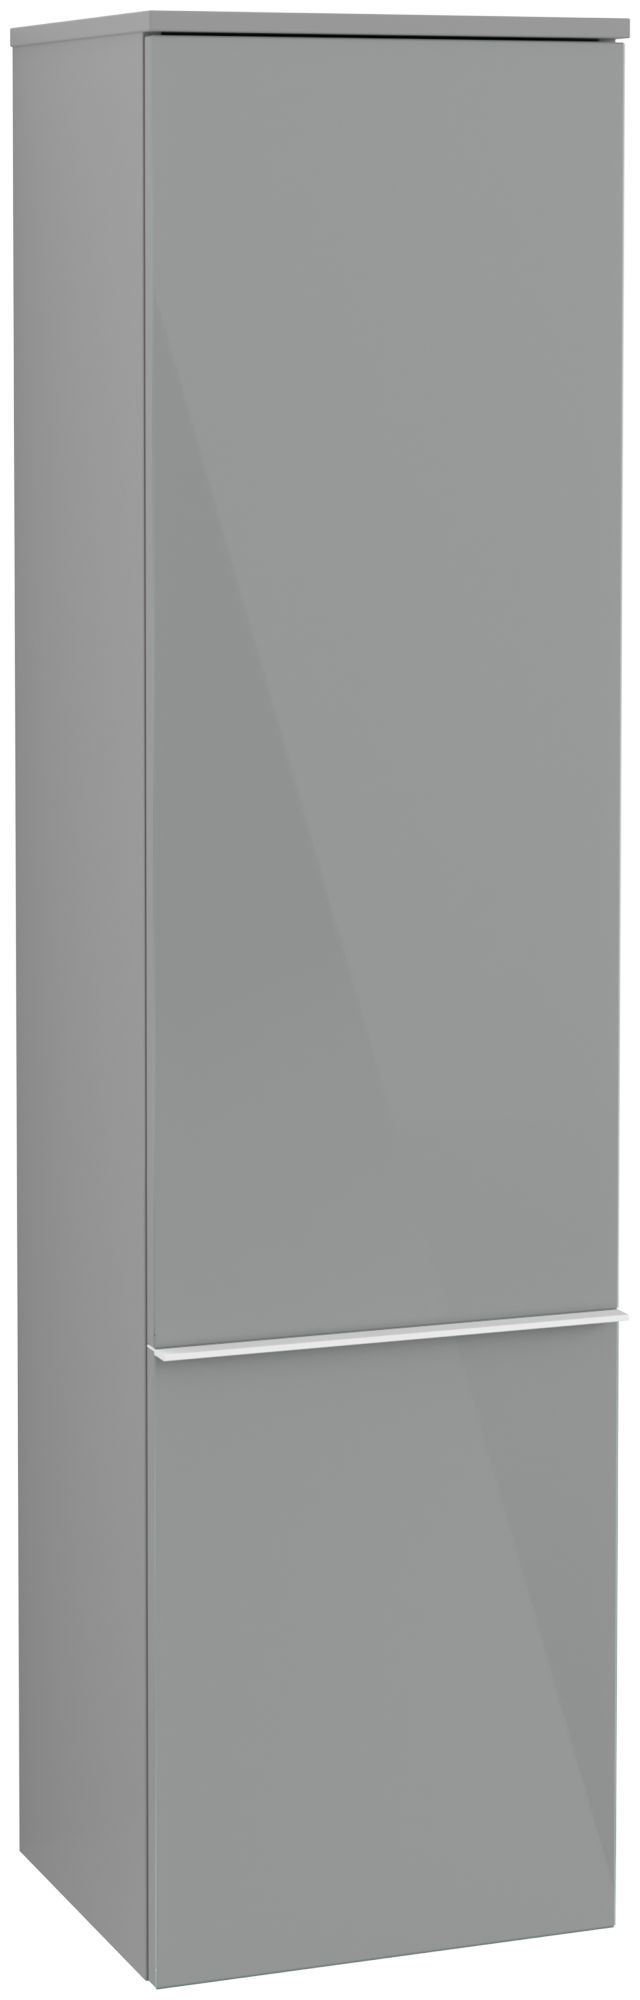 Villeroy & Boch Venticello Hochschrank 1 Tür Anschlag links B:40,4xH:154,6xT:37,2cm Glas glossy grey Griffe white Griffe weiß A95102RA